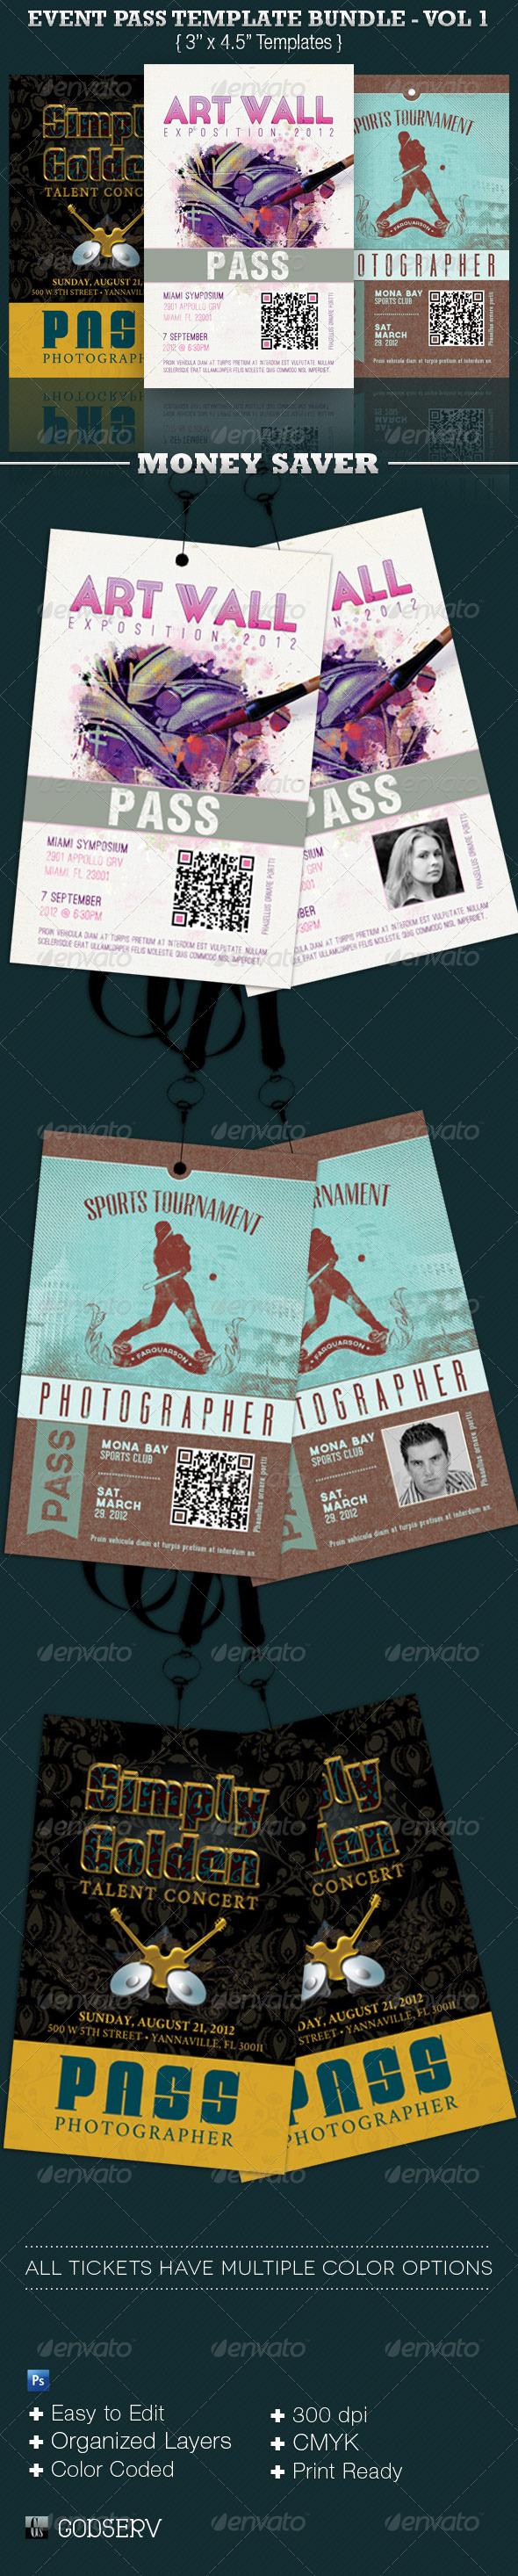 GraphicRiver Event Pass Template Bundle Volume 1 3958970